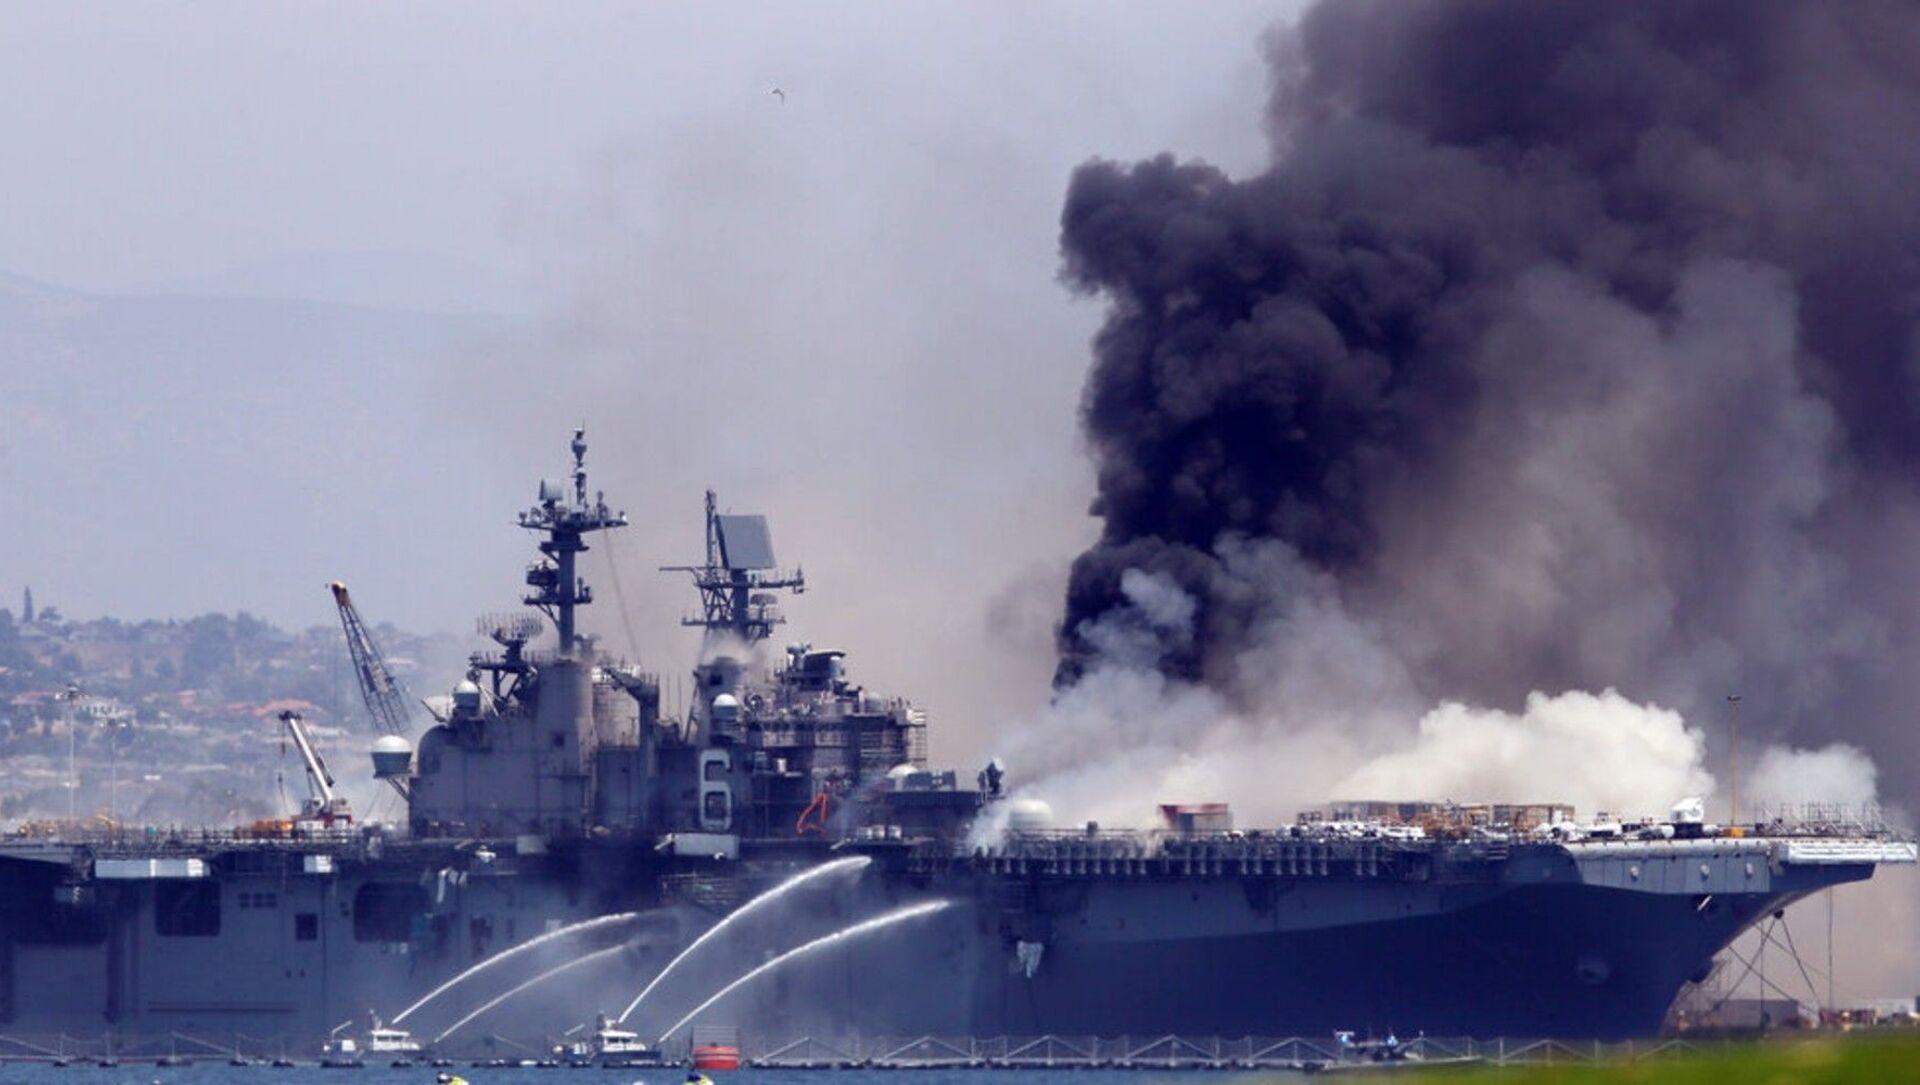 Sailor Investigated for Arson in U.S.S. Bonhomme Richard Fire - Sputnik International, 1920, 29.07.2021